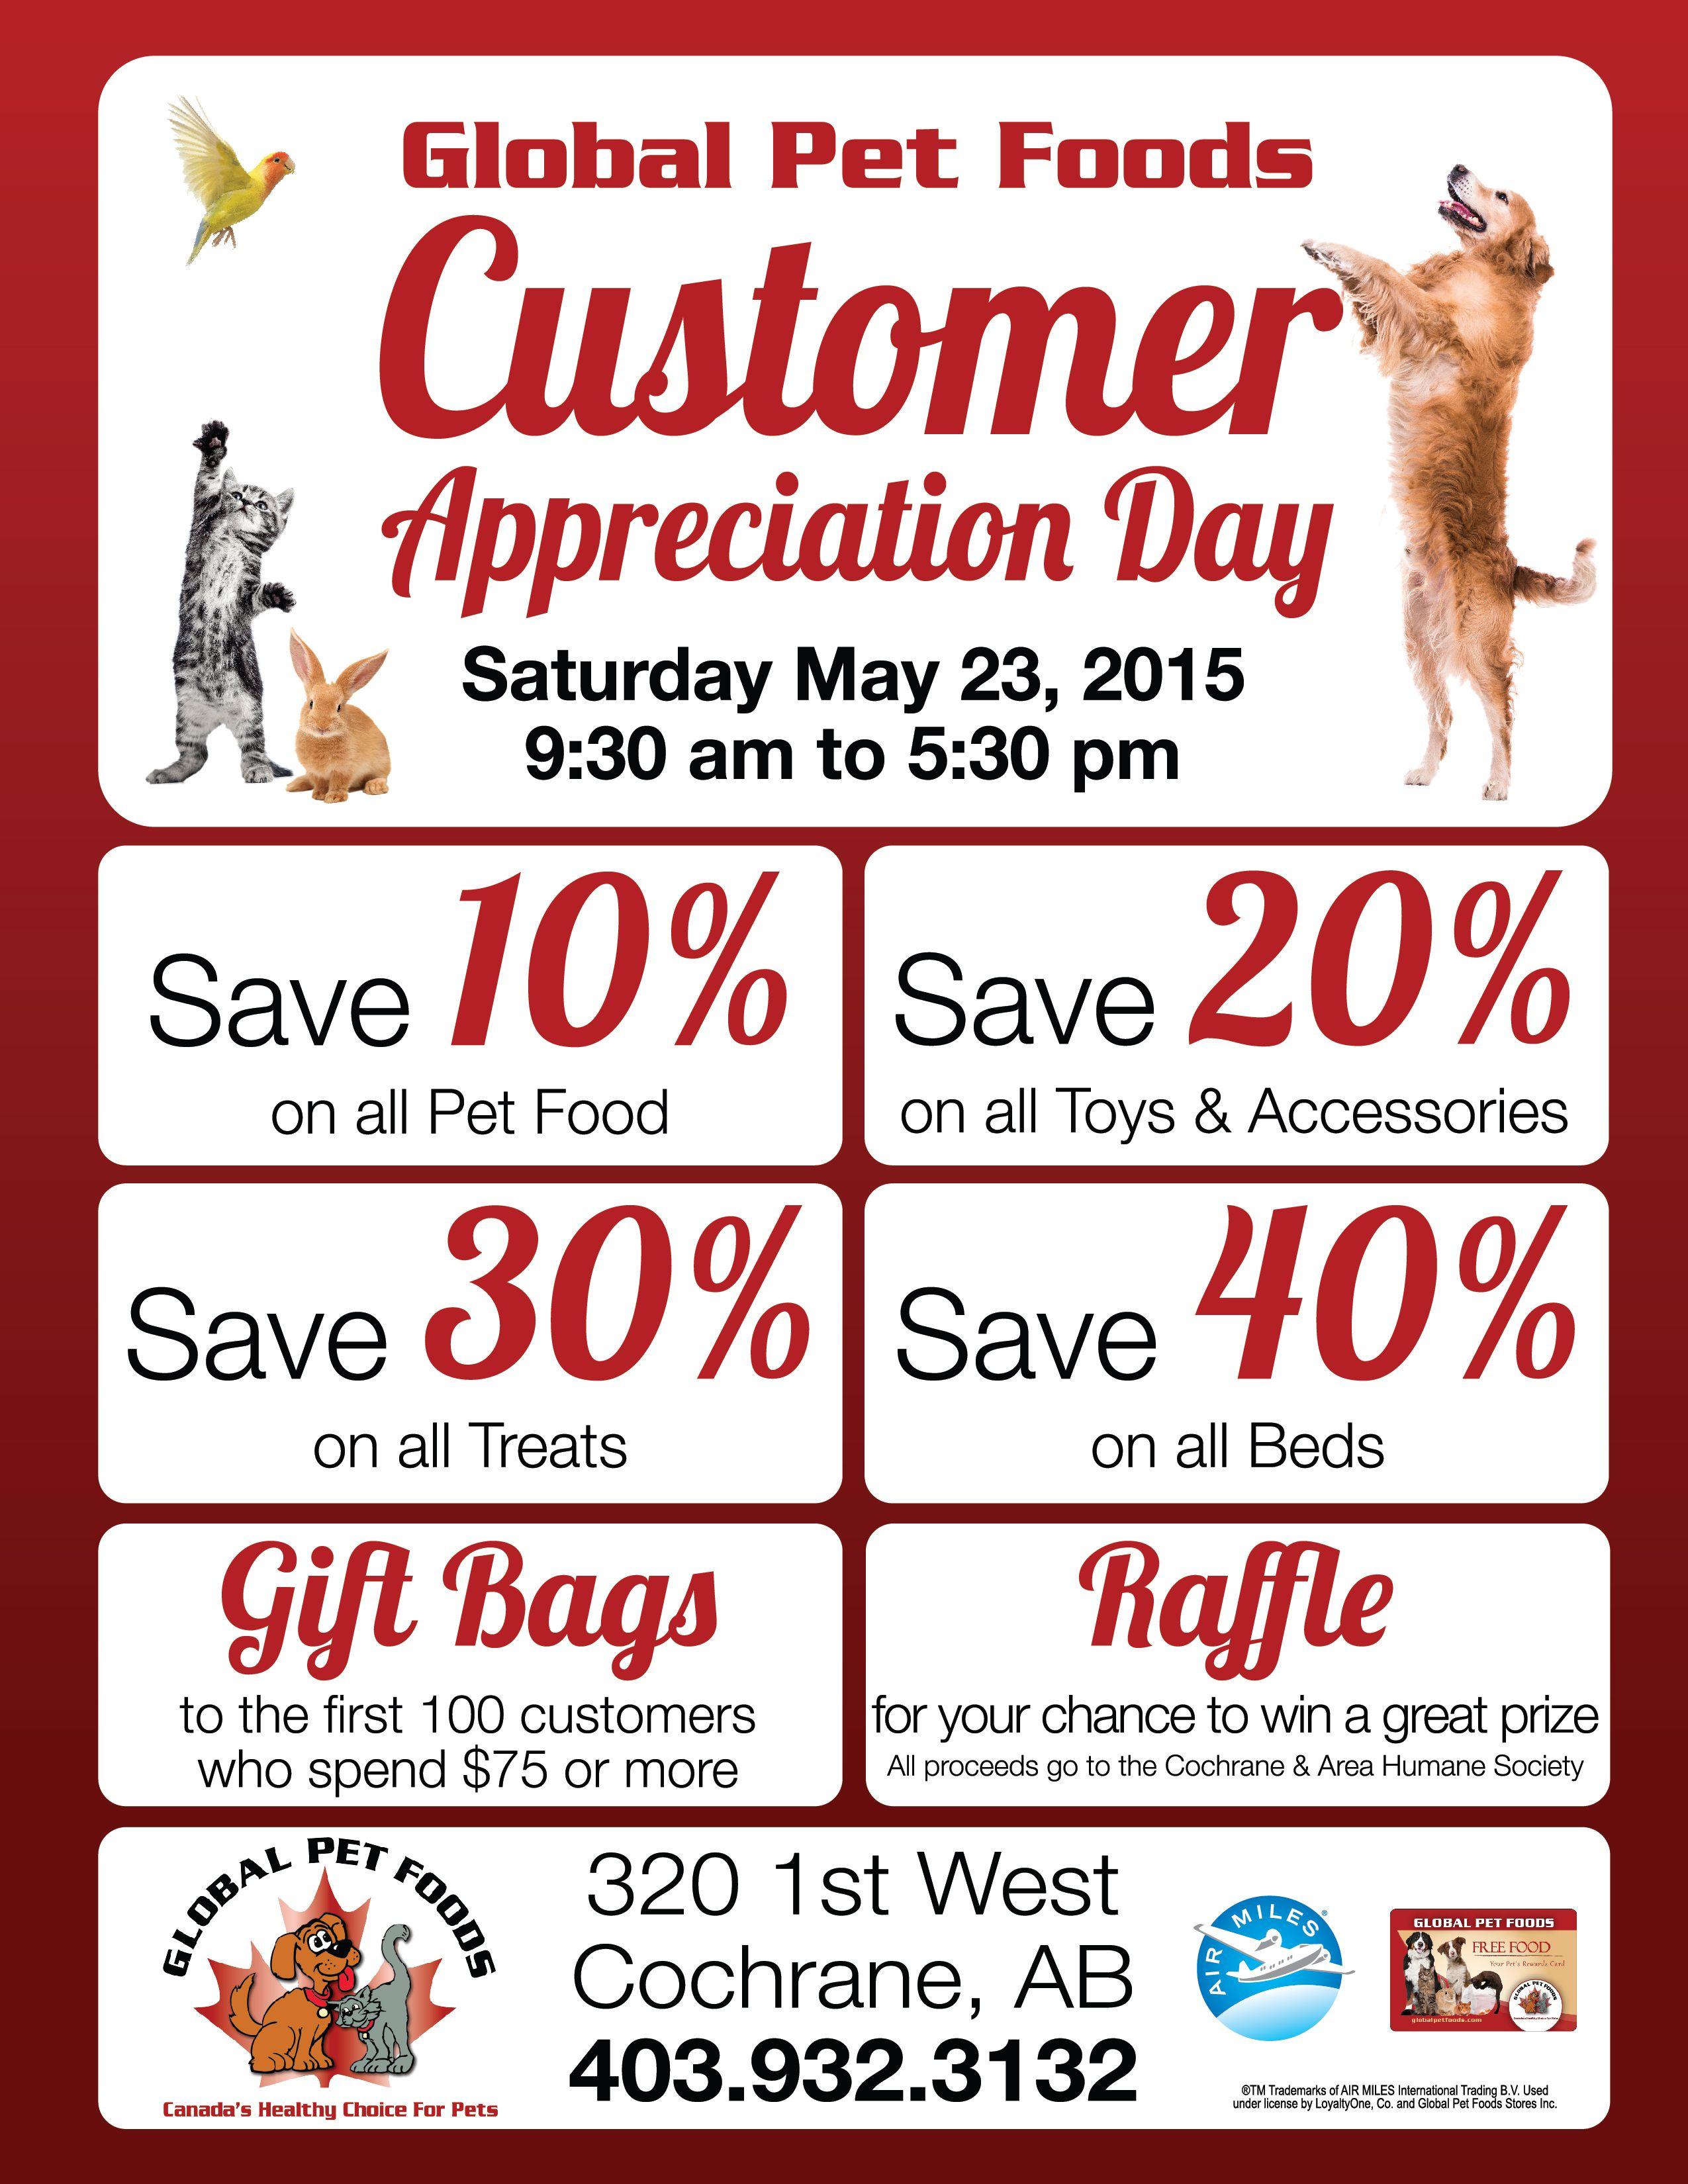 The Global Pet Foods Store In Cochrane Alberta Is Celebrating